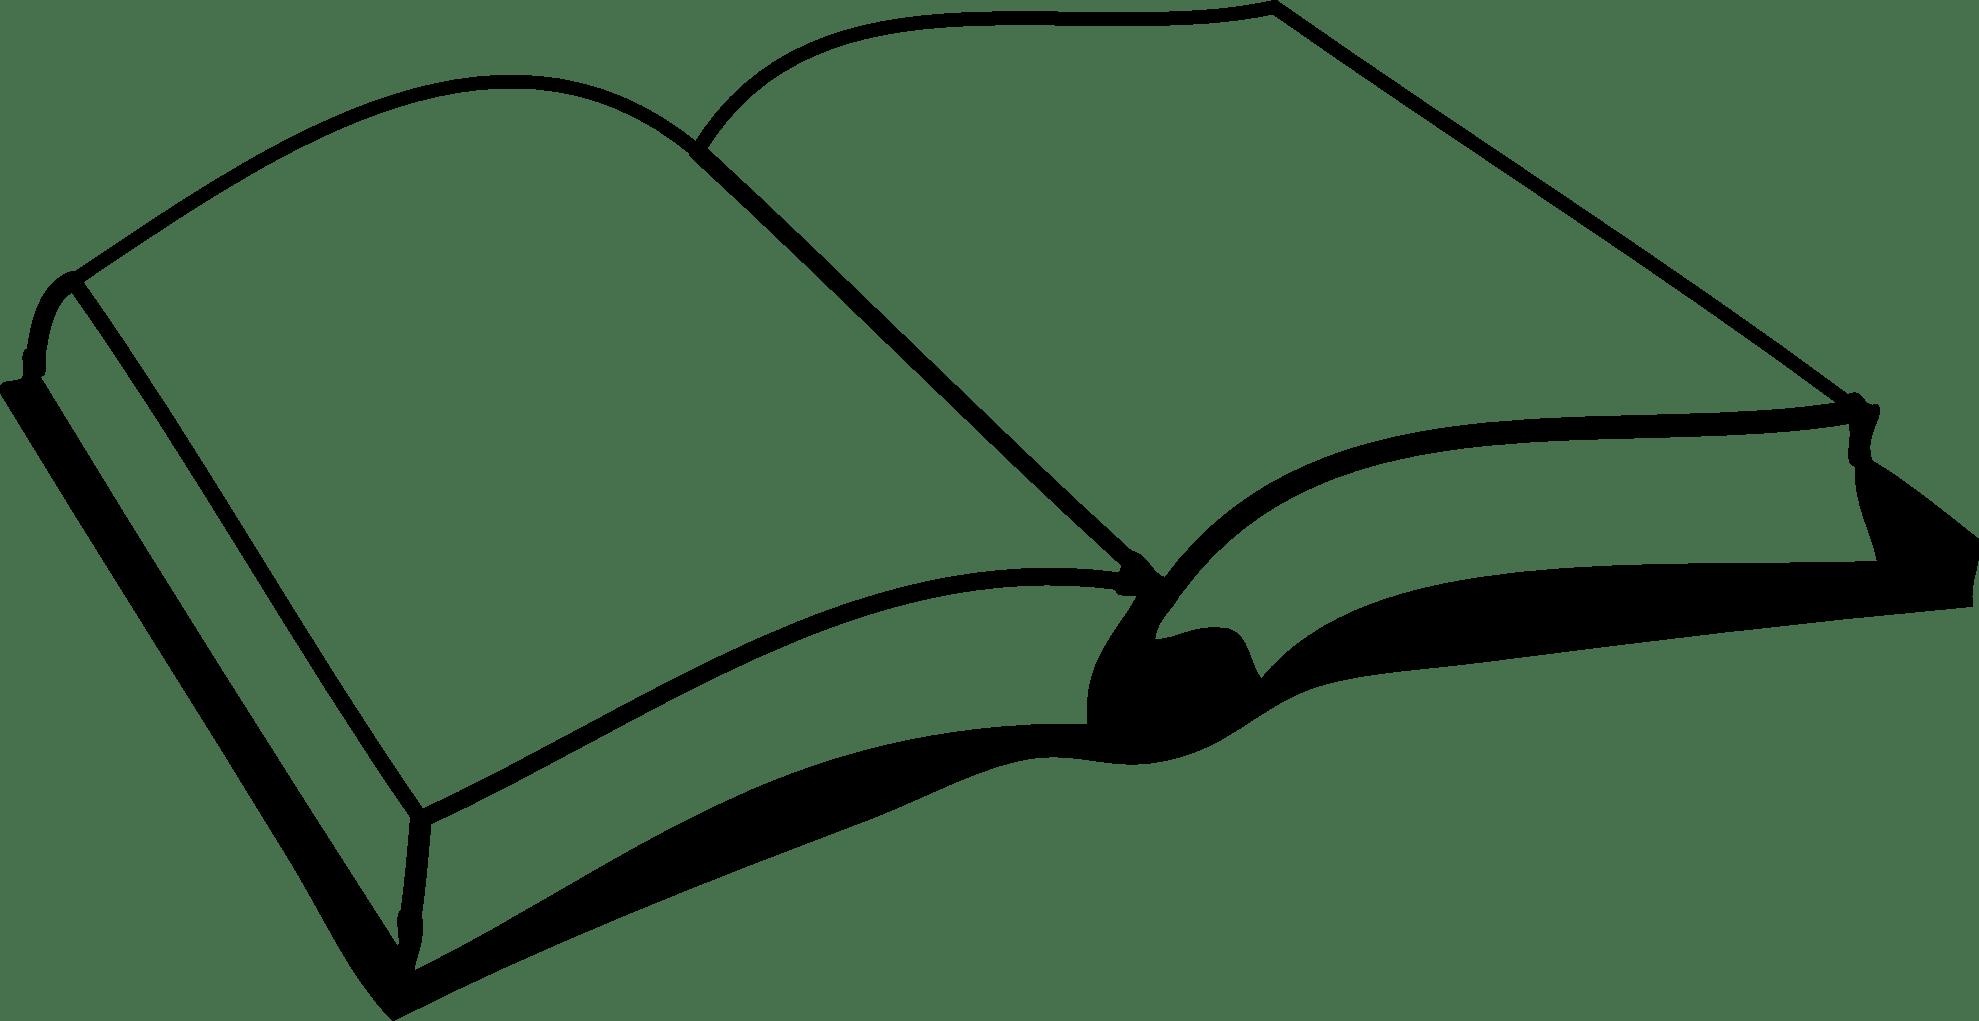 Stack Of Books Clip Art Black And White